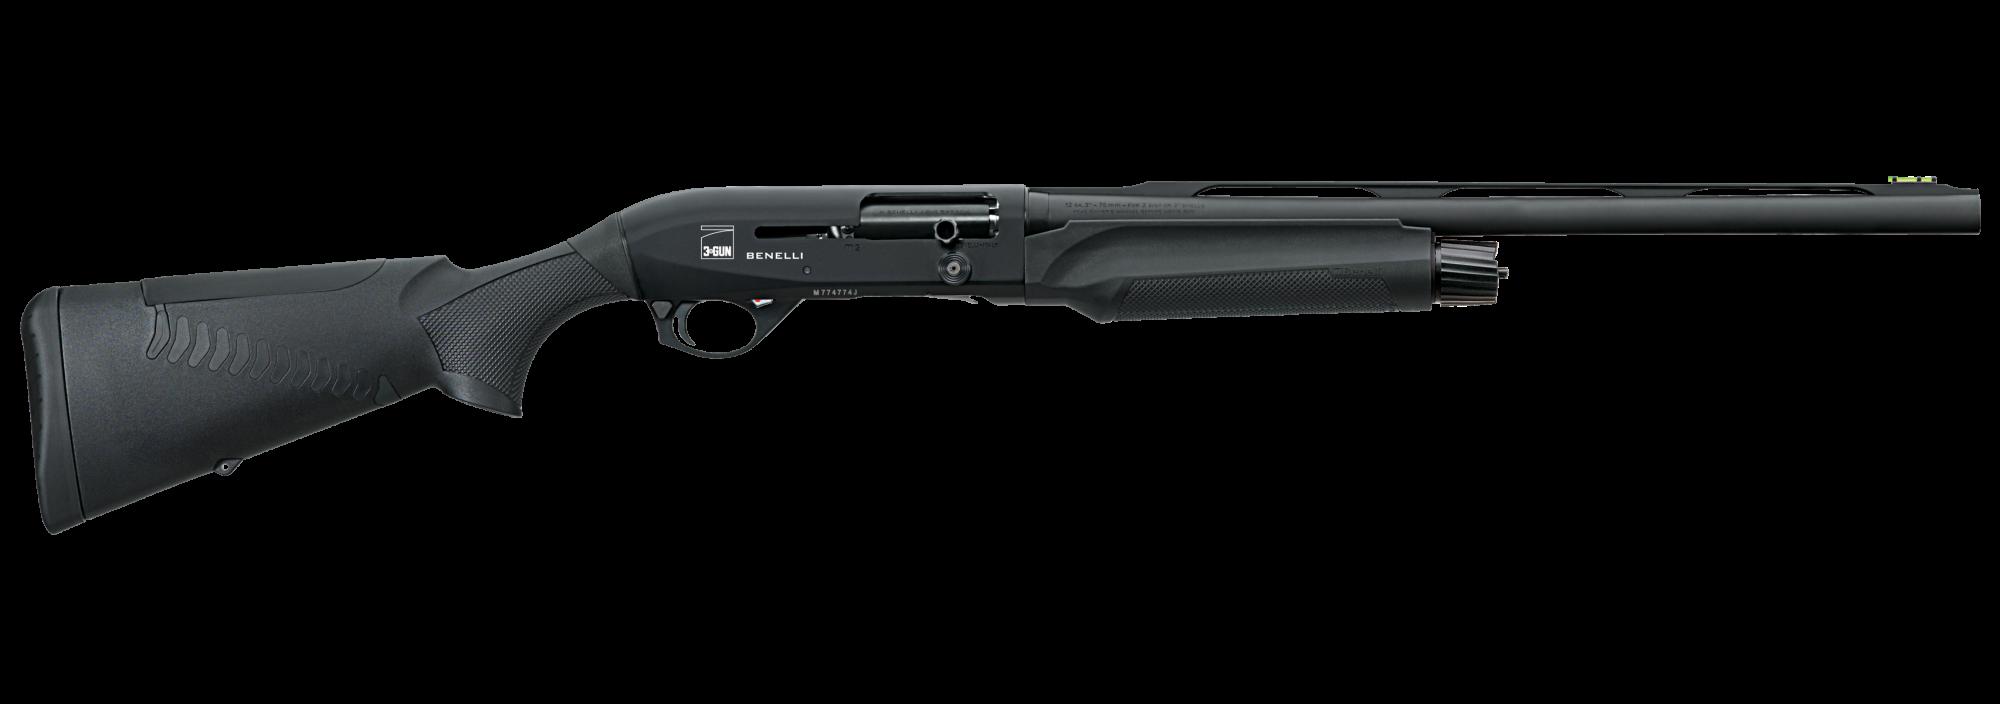 Gun PNG - 16232